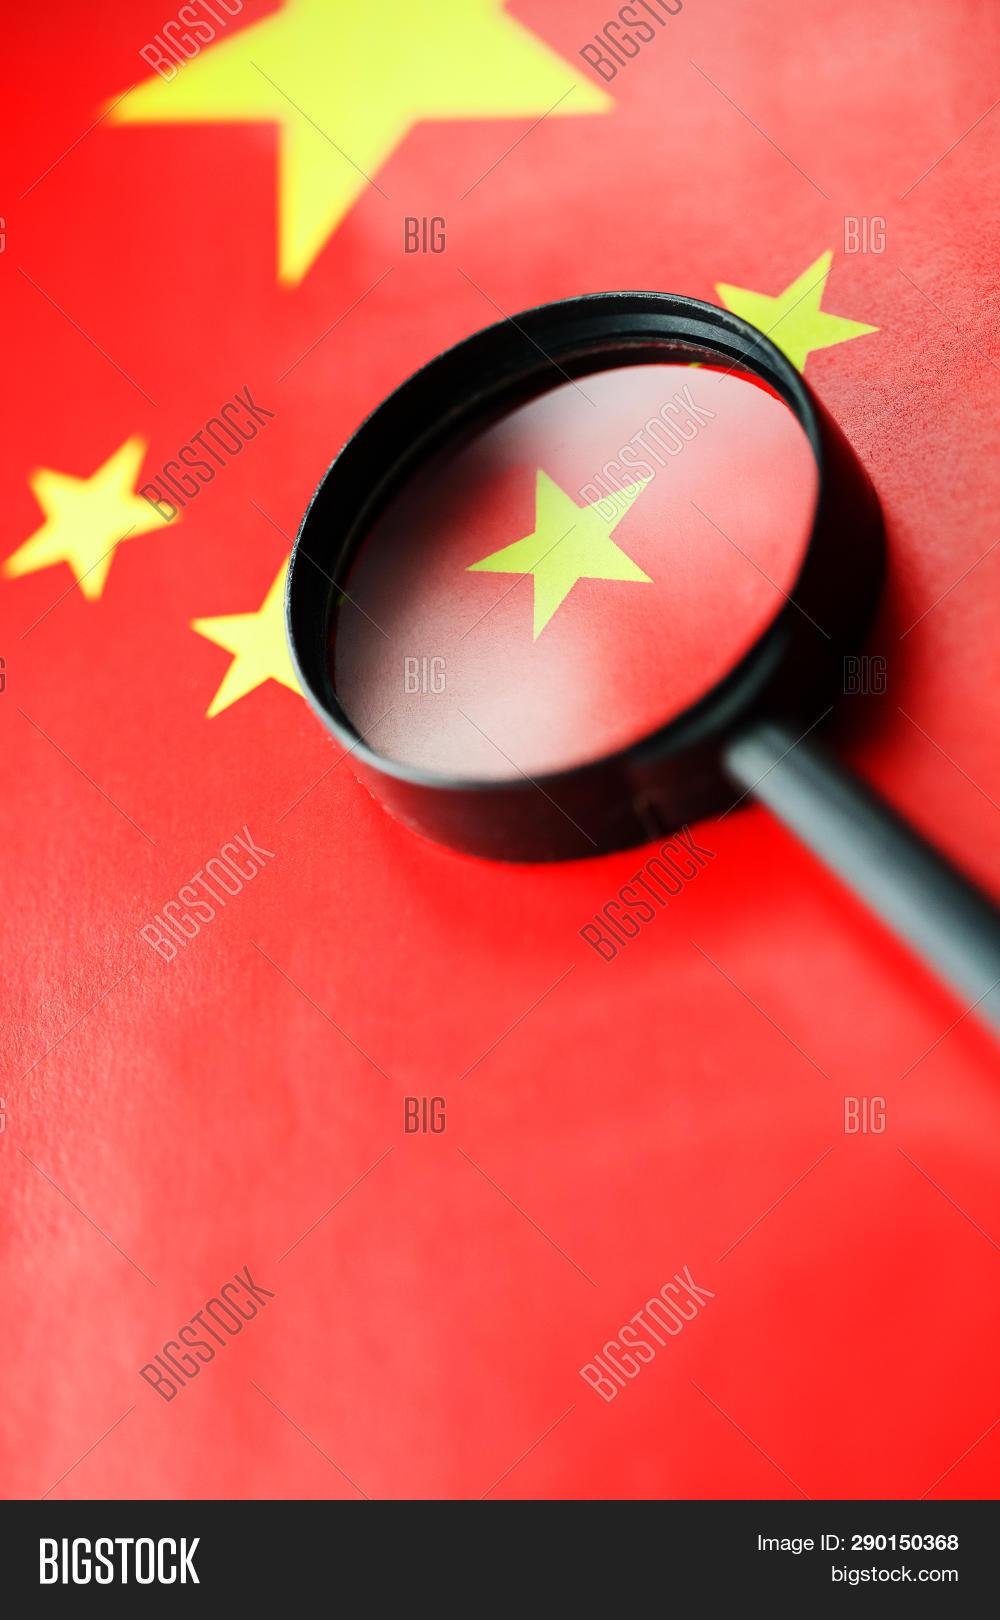 Peoples Republic China Image & Photo (Free Trial)   Bigstock